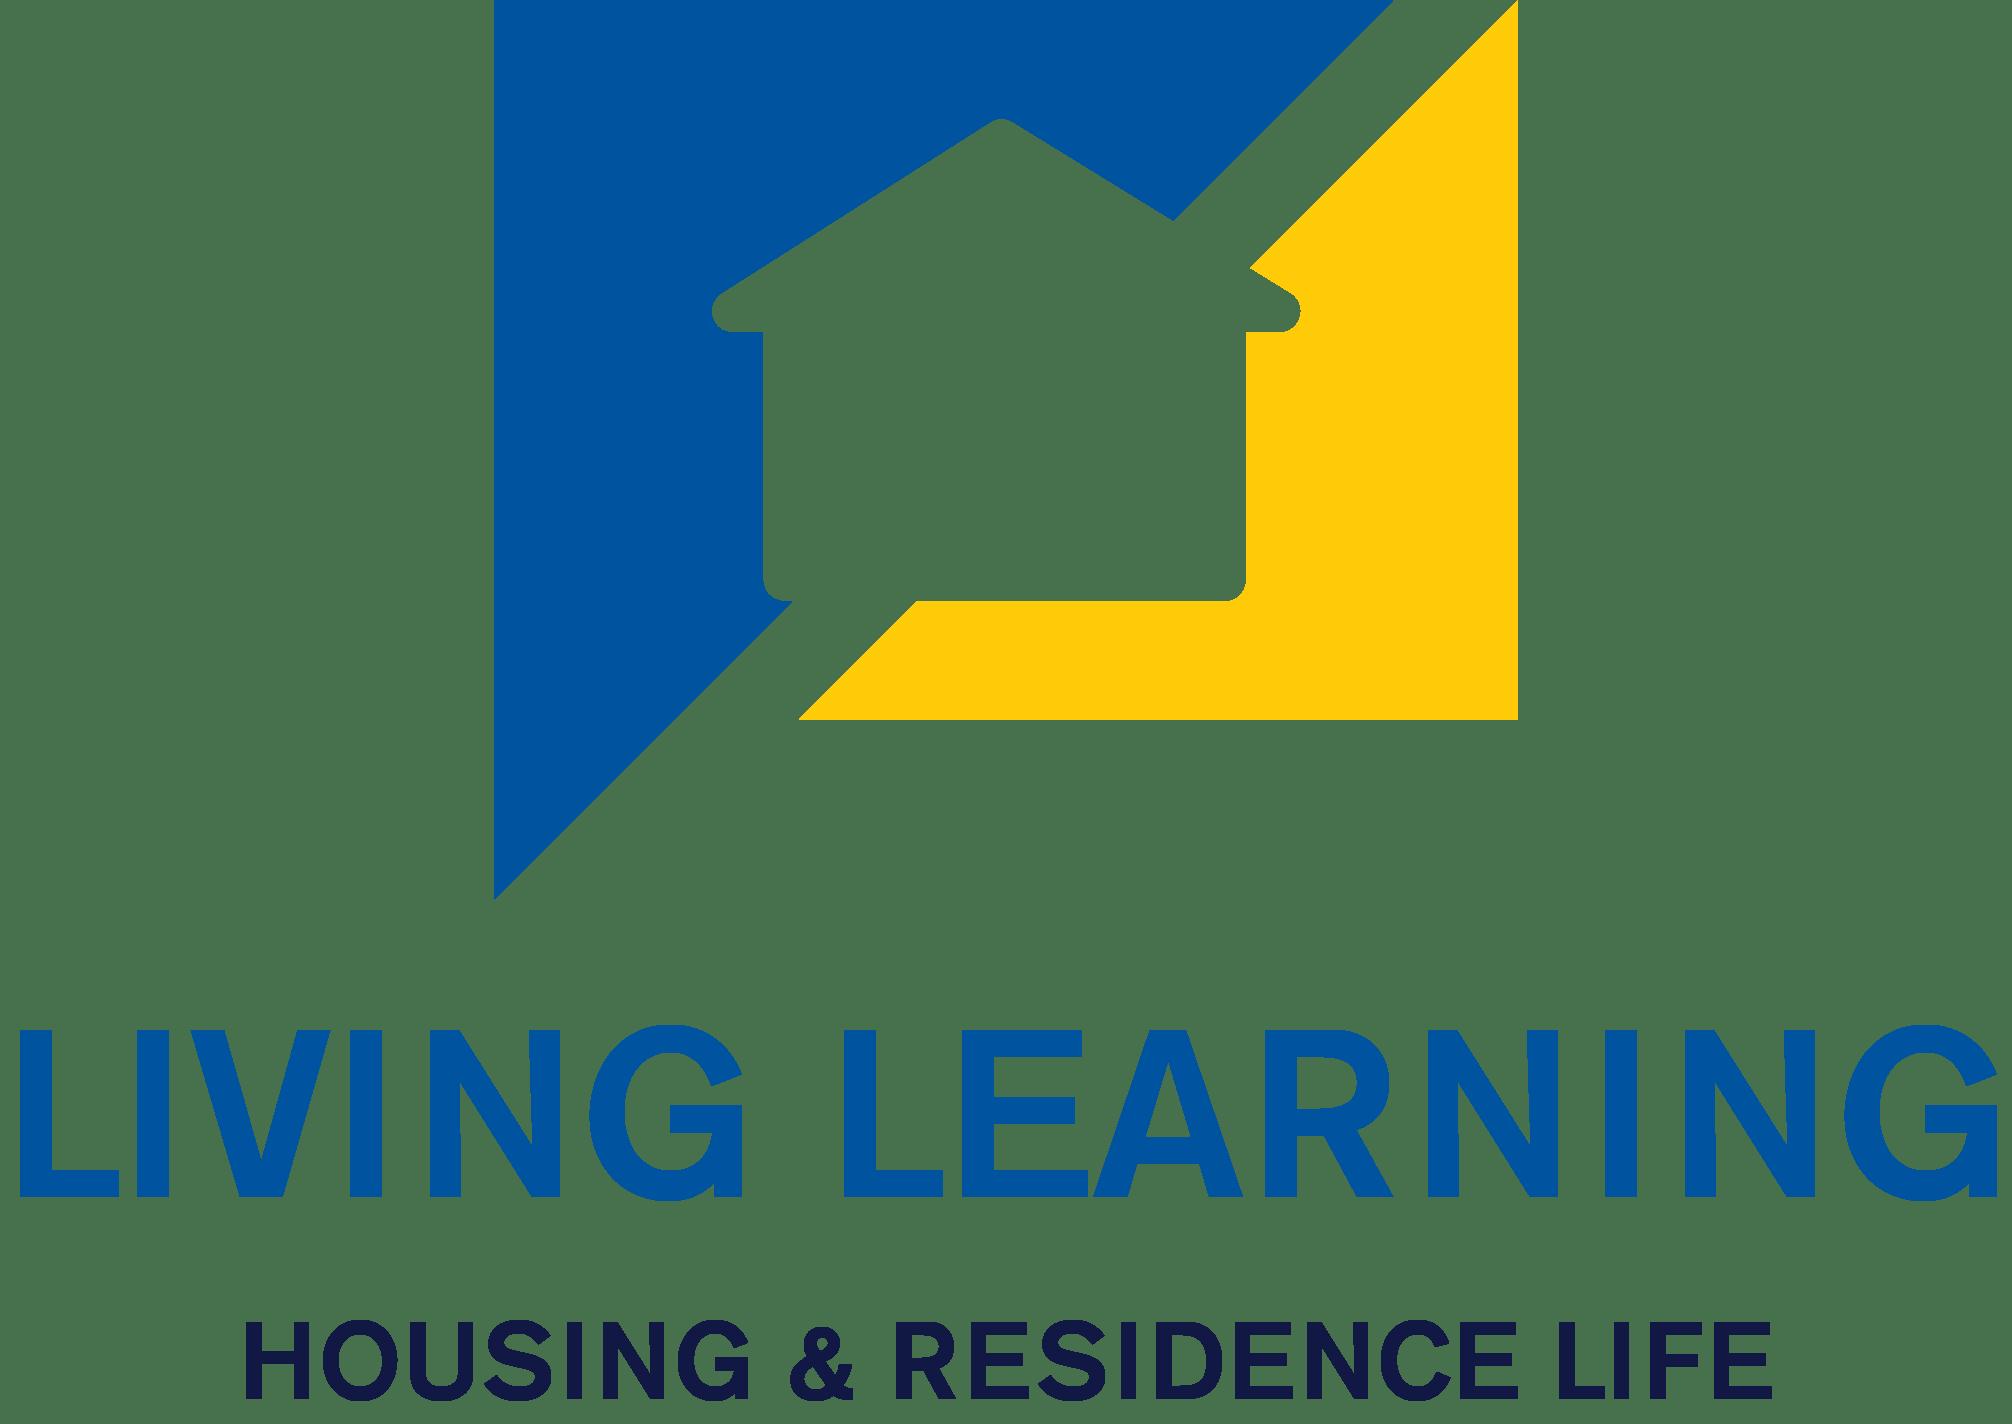 Living Learning Programs Embry Riddle Aeronautical University